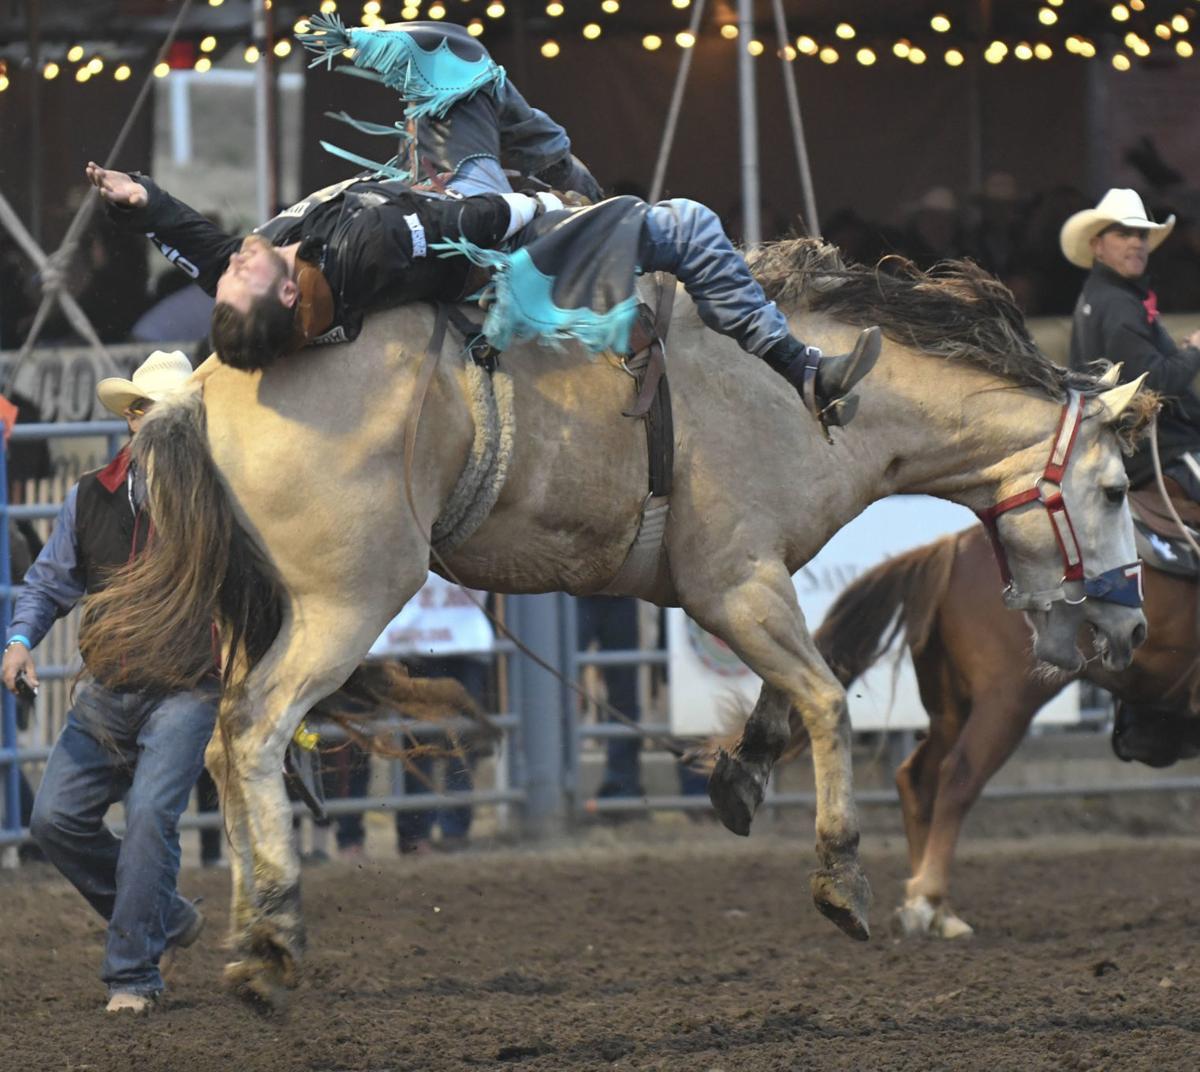 053119 Elks Rodeo Friday 01.jpg